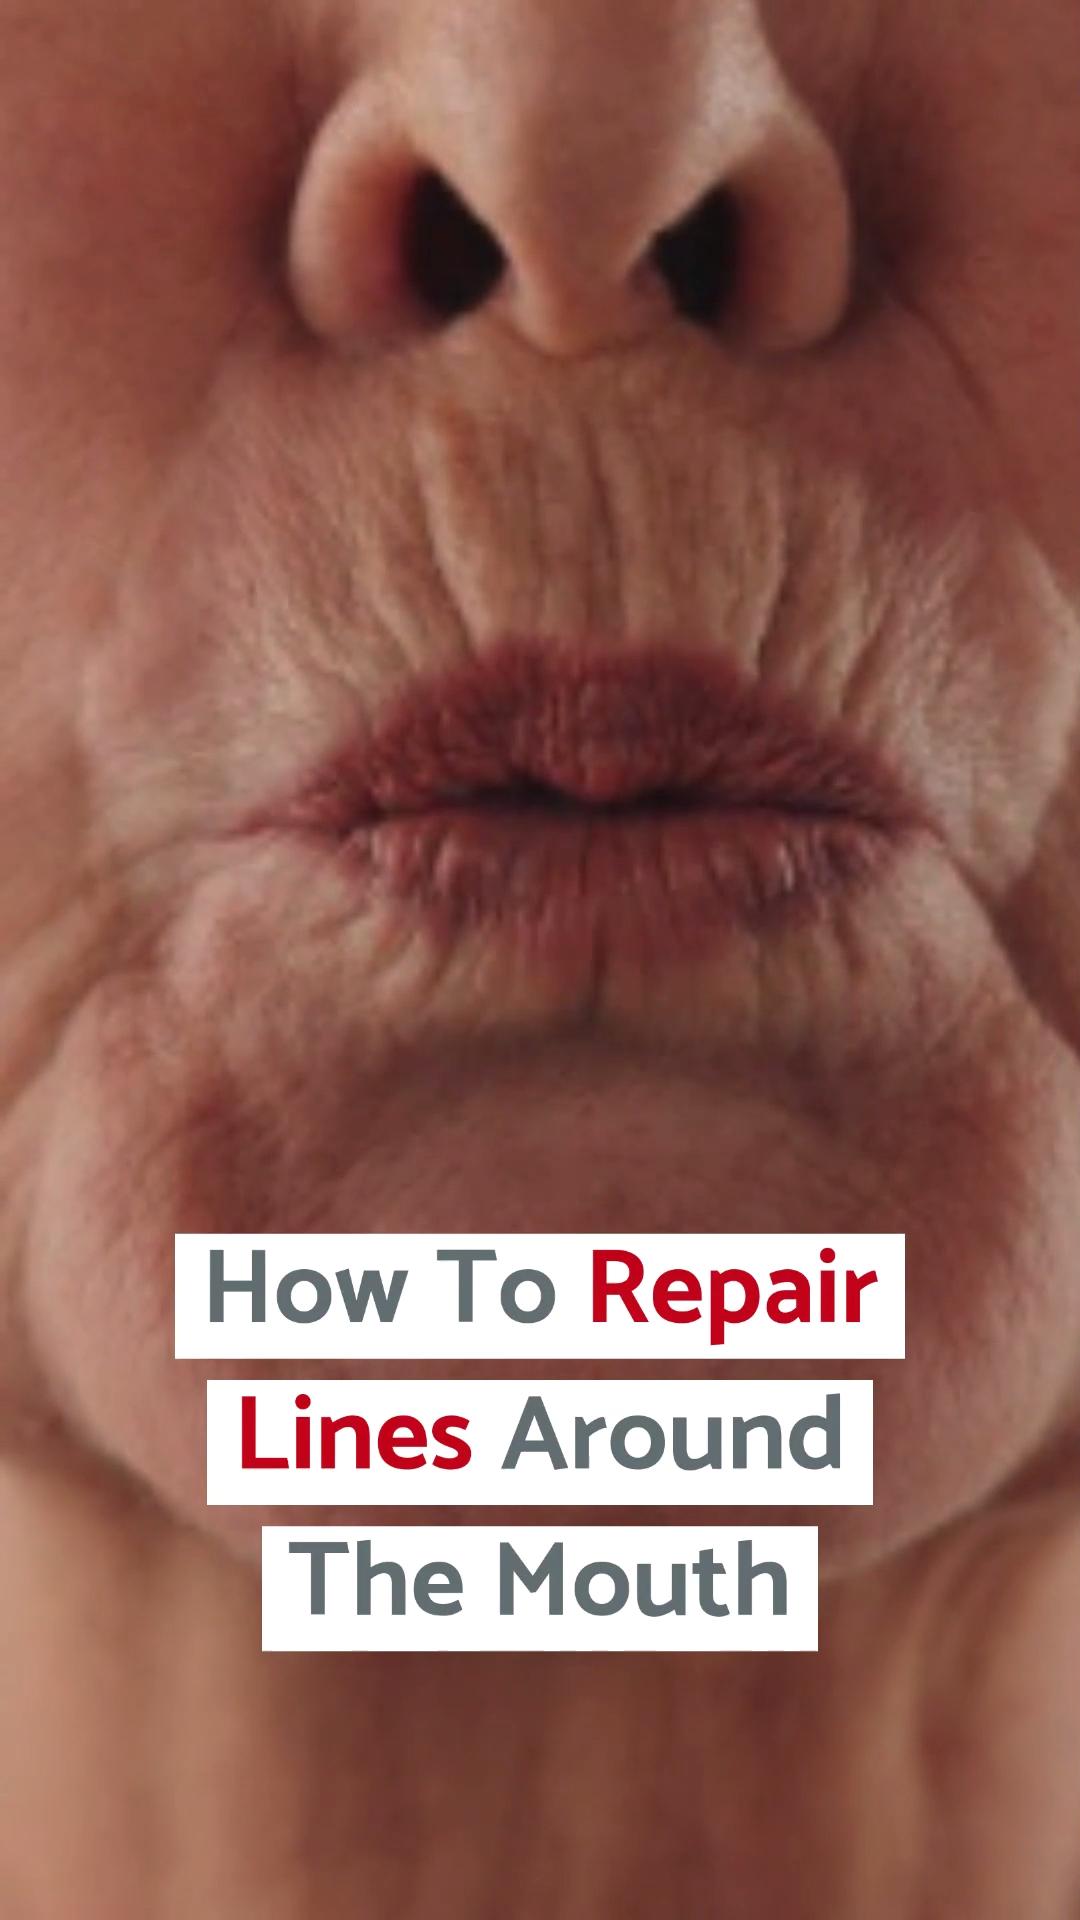 Photo of How To Maintain Healthy & Luminous Lips